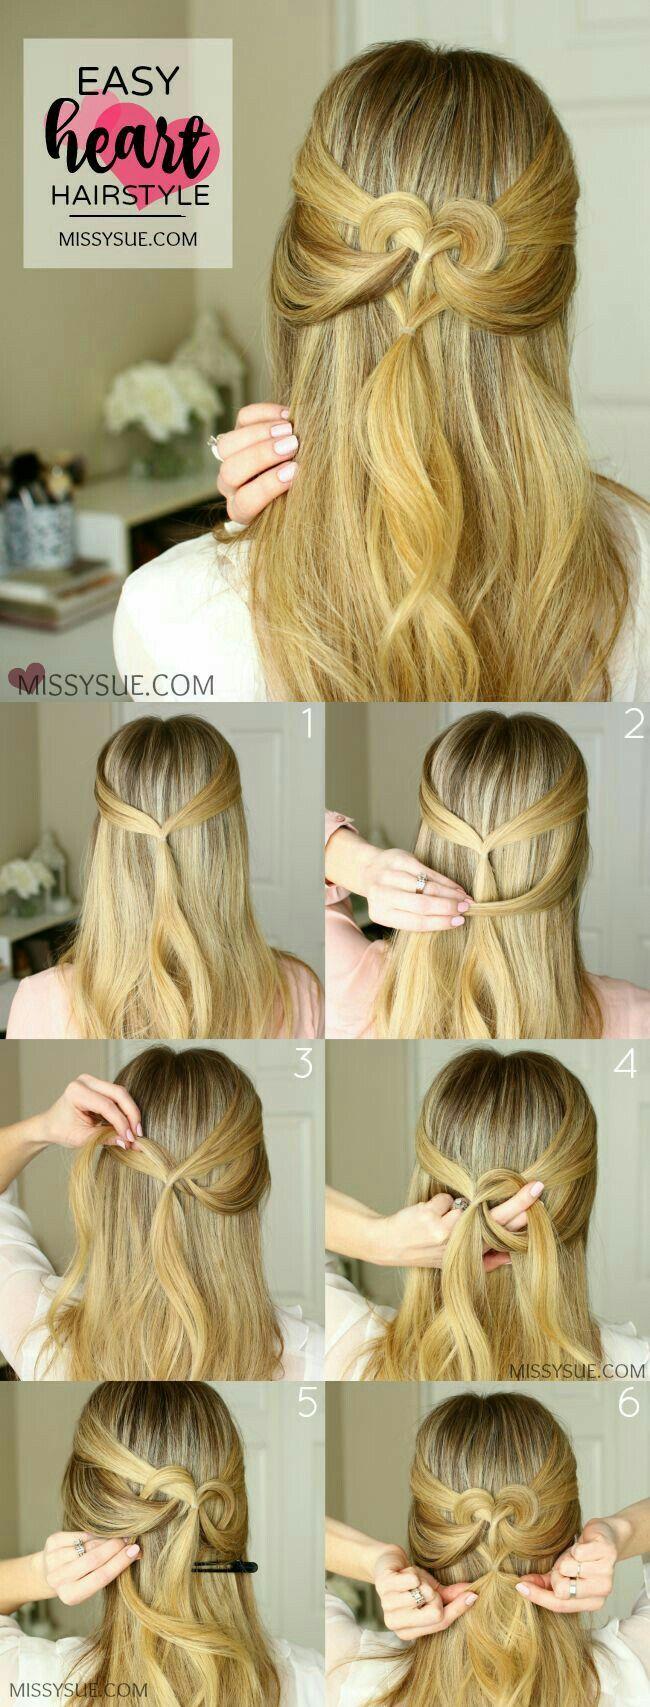 Hair style hair braidsponytailsbuns pinterest hair style